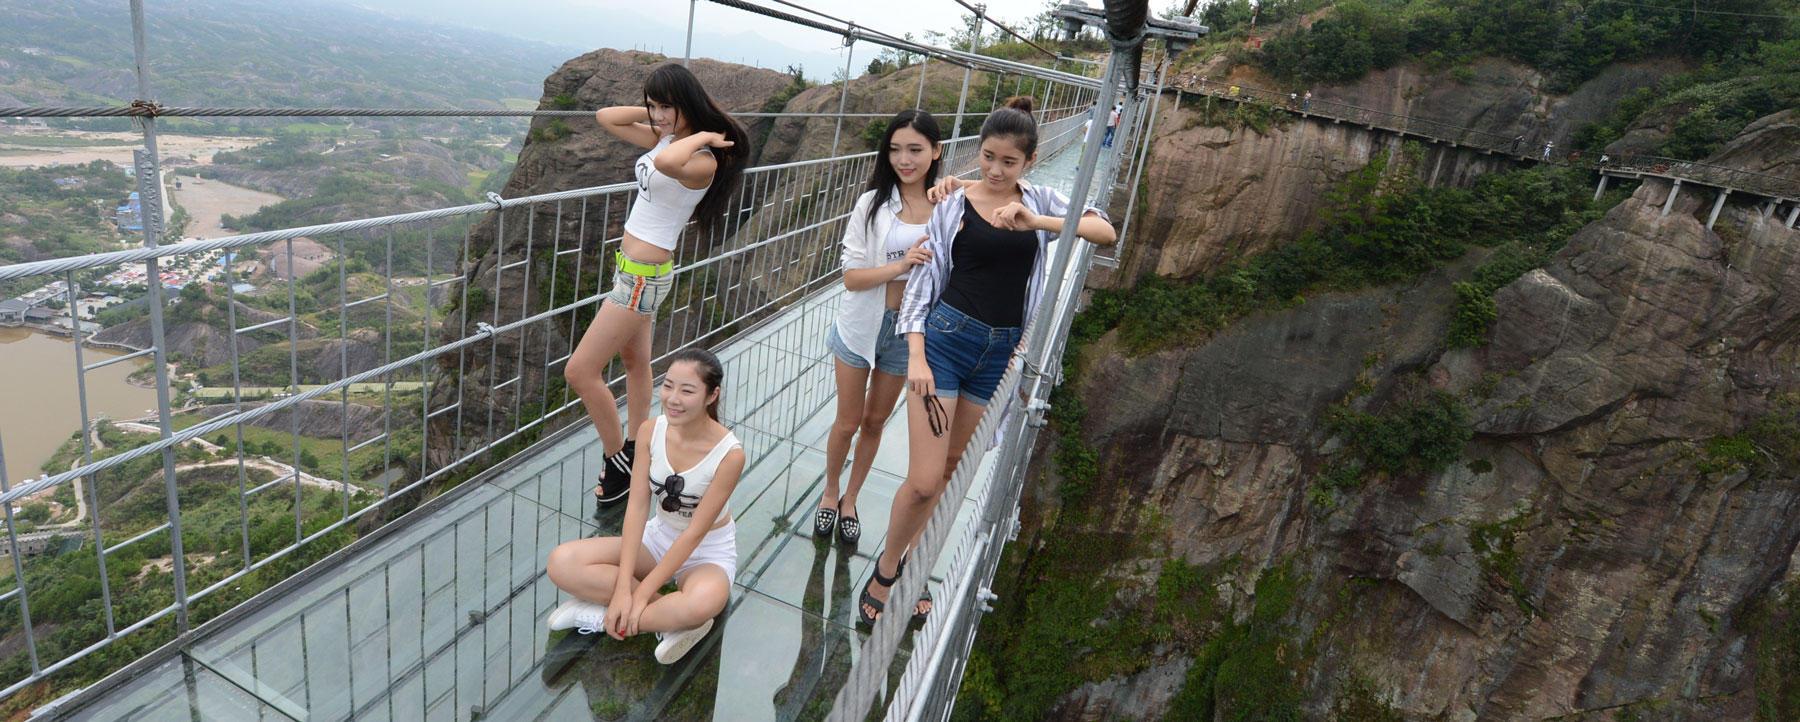 Visitors on Brave Man's Bridge